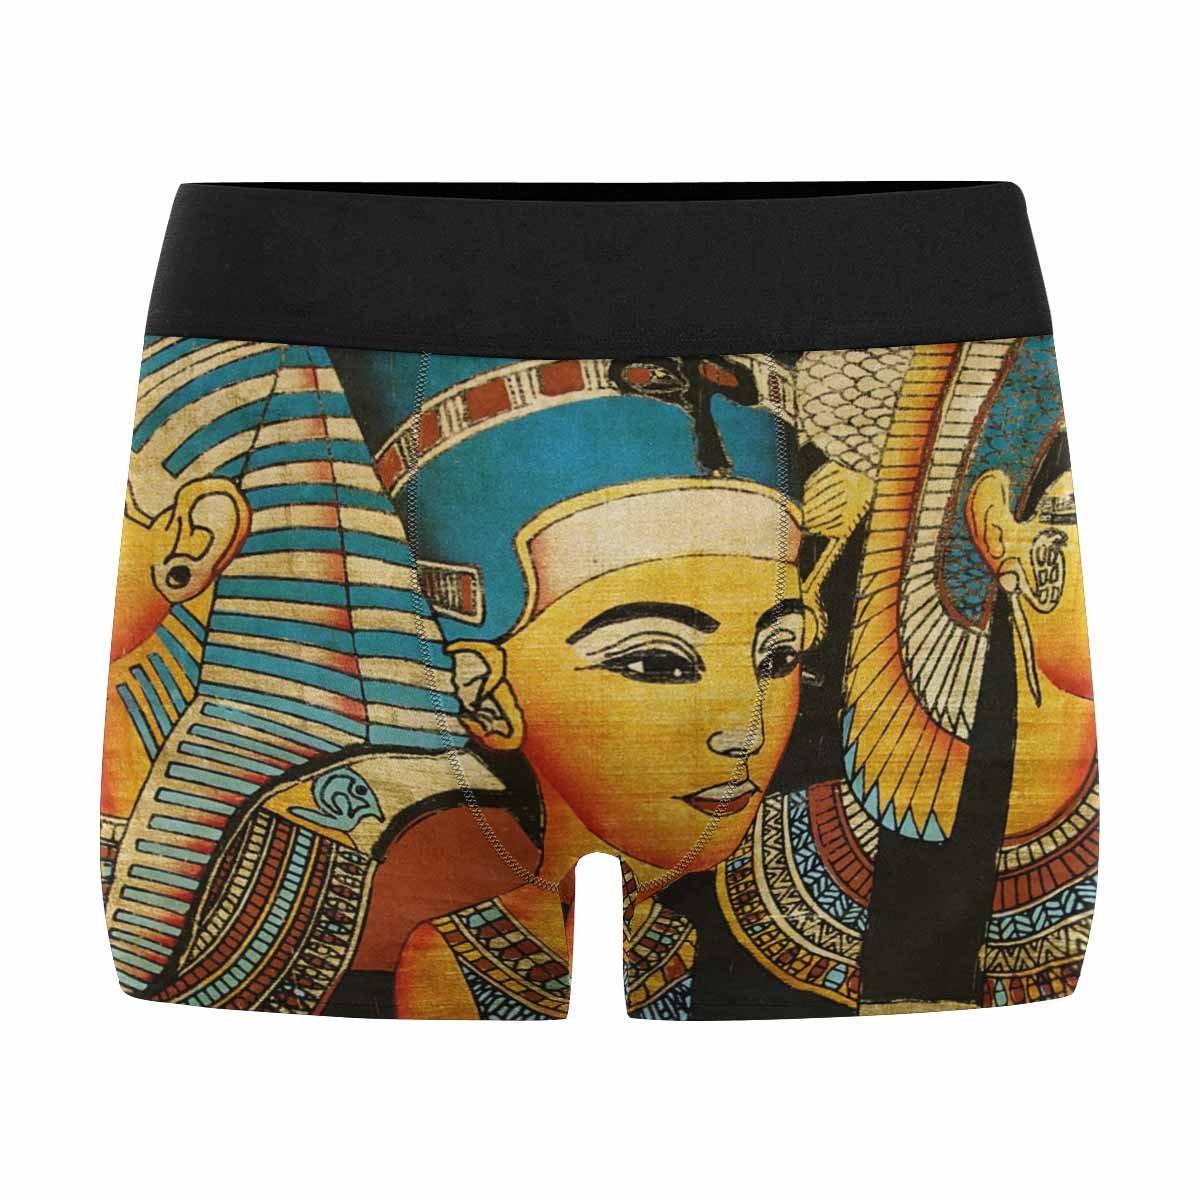 XS-3XL INTERESTPRINT Boxer Briefs Mens Underwear Ancient Egyptian Parchment